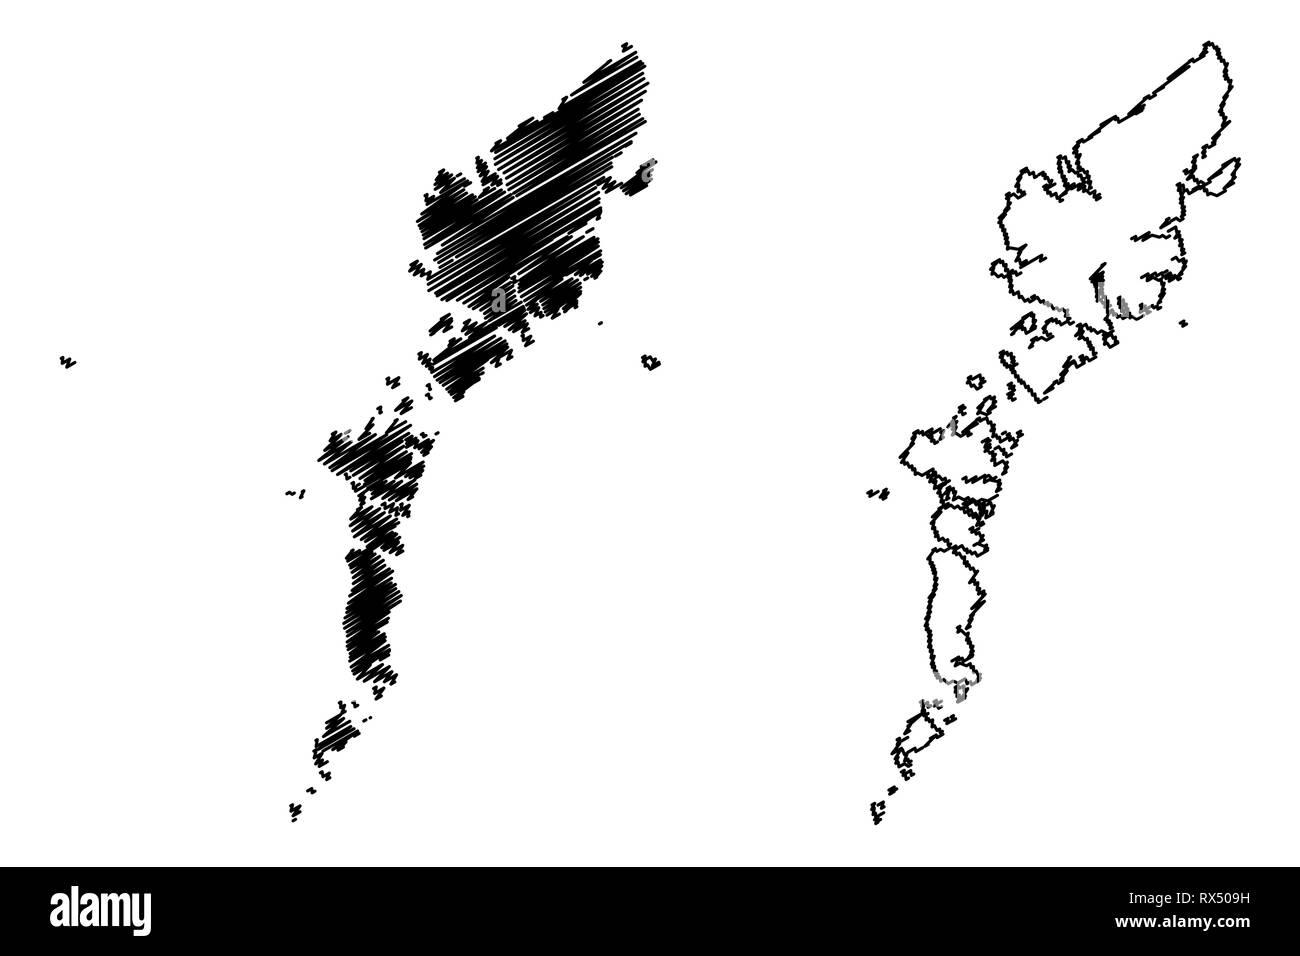 Comhairle nan Eilean Siar (United Kingdom, Scotland, Local government in Scotland) map vector illustration, scribble sketch Na h-Eileanan Siar ( Outer - Stock Vector